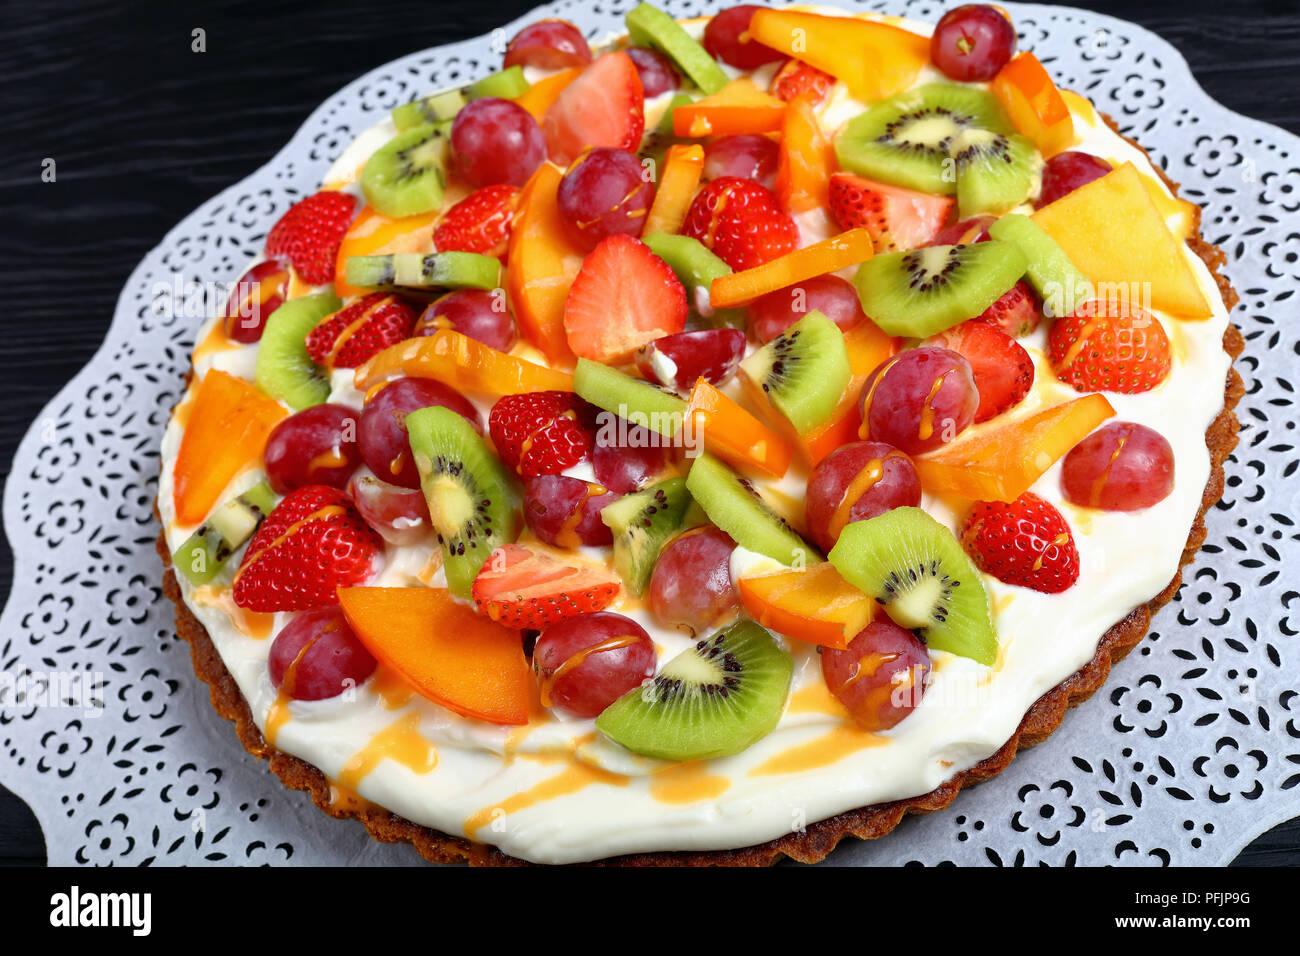 Tarta De Frutas Con Crema De Queso Decorado Con Rebanadas De